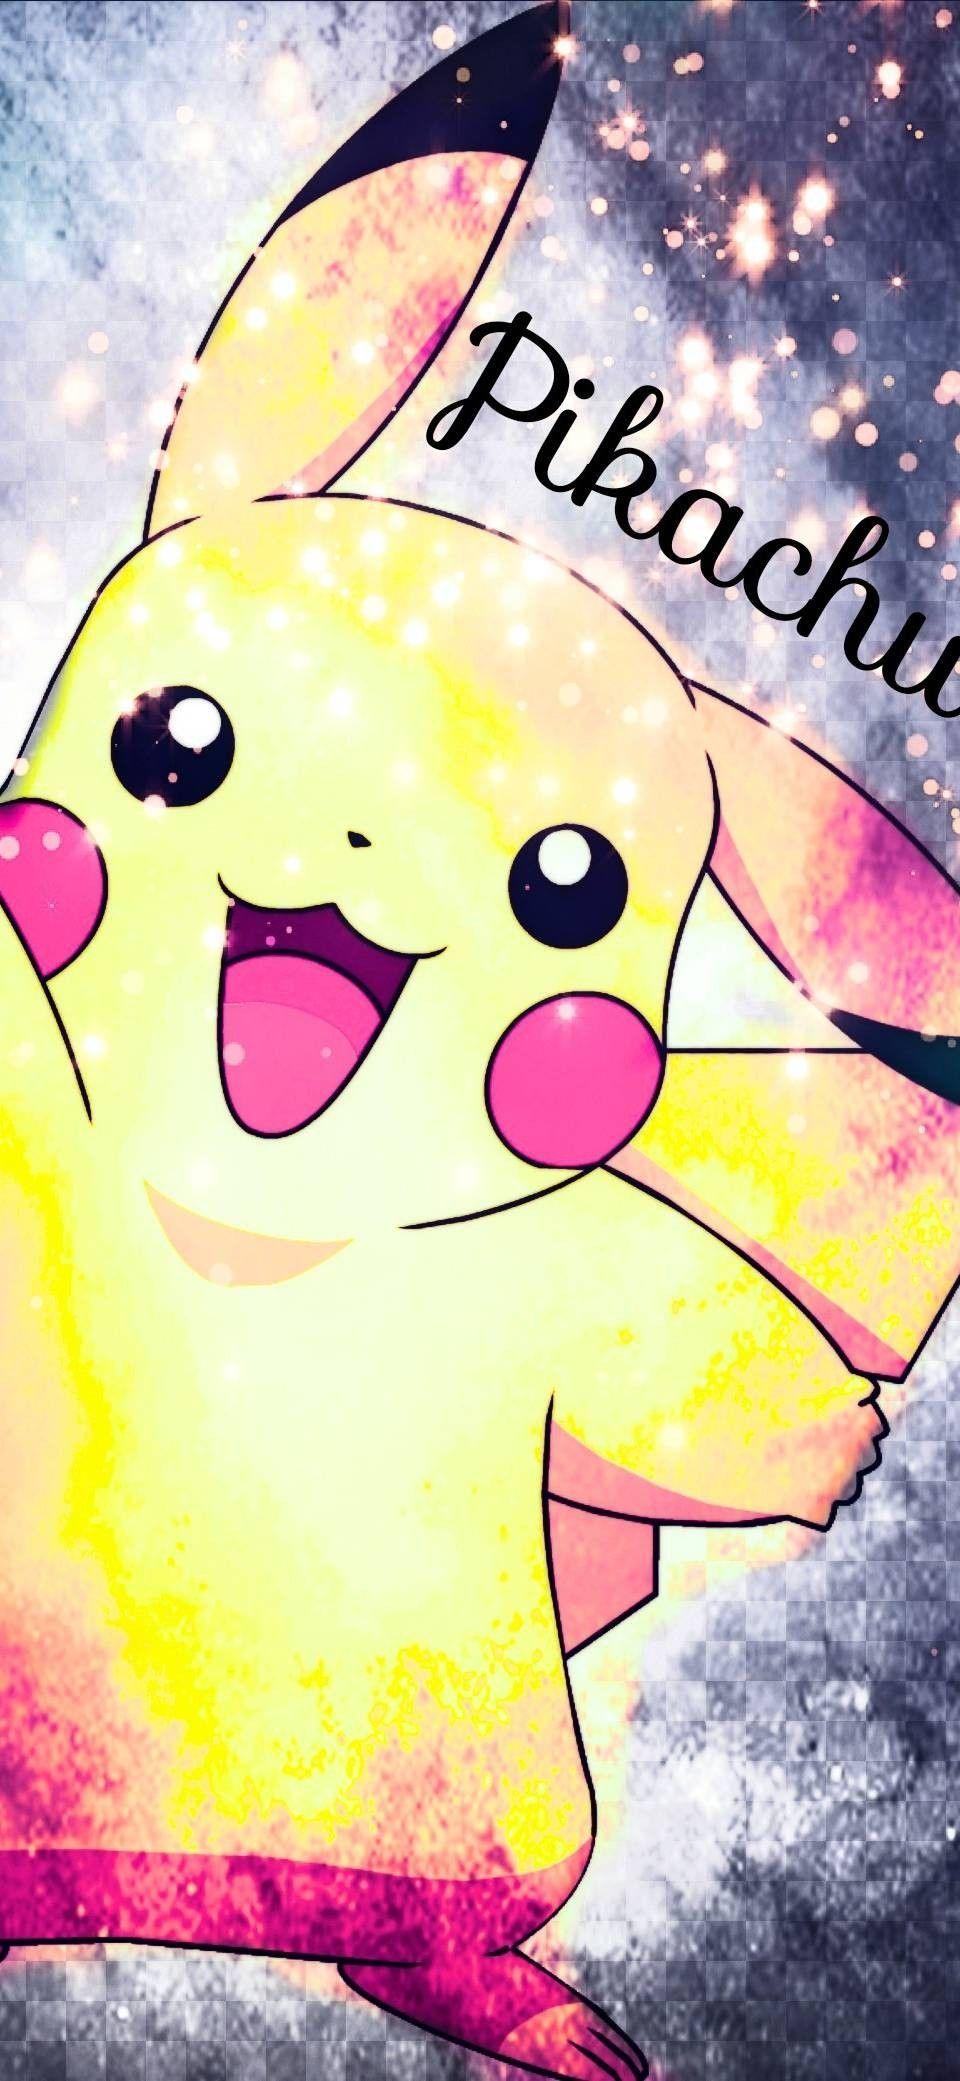 Pin On Fotos Tumblr Pikachu Wallpaper Iphone Pikachu Wallpaper Cute Pokemon Wallpaper